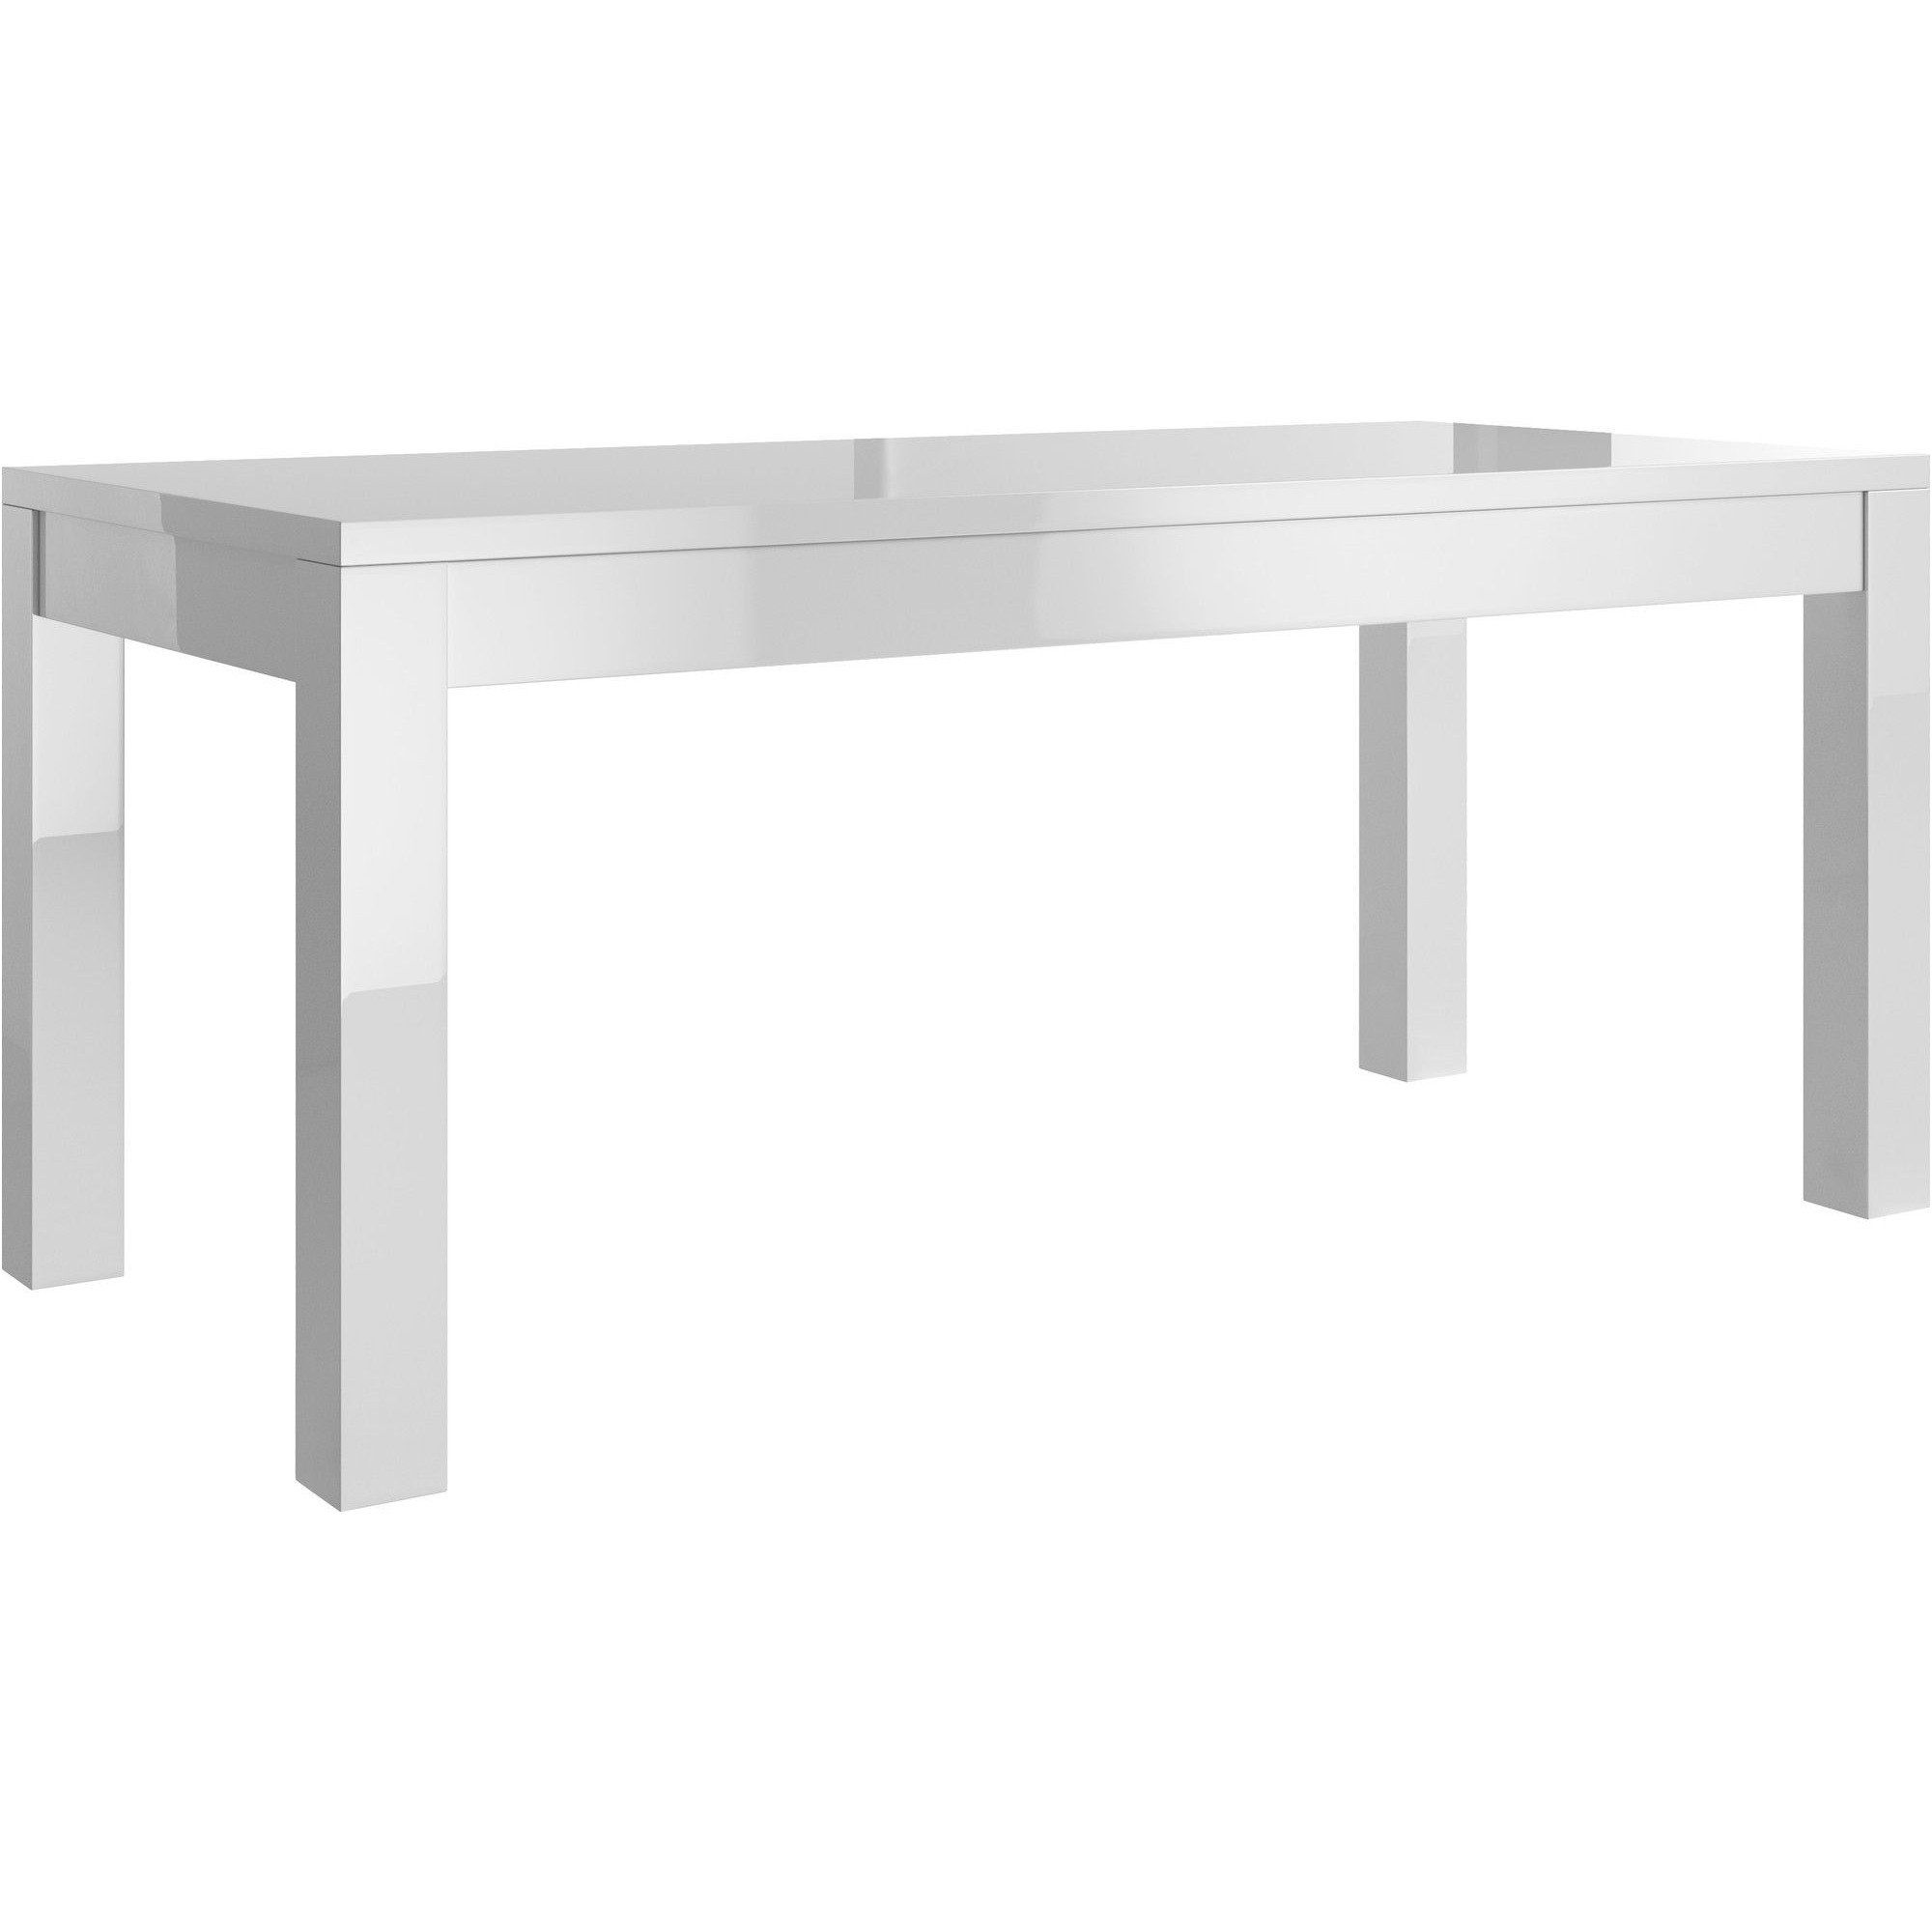 9 Aimable Table Grise Et Blanche Pics